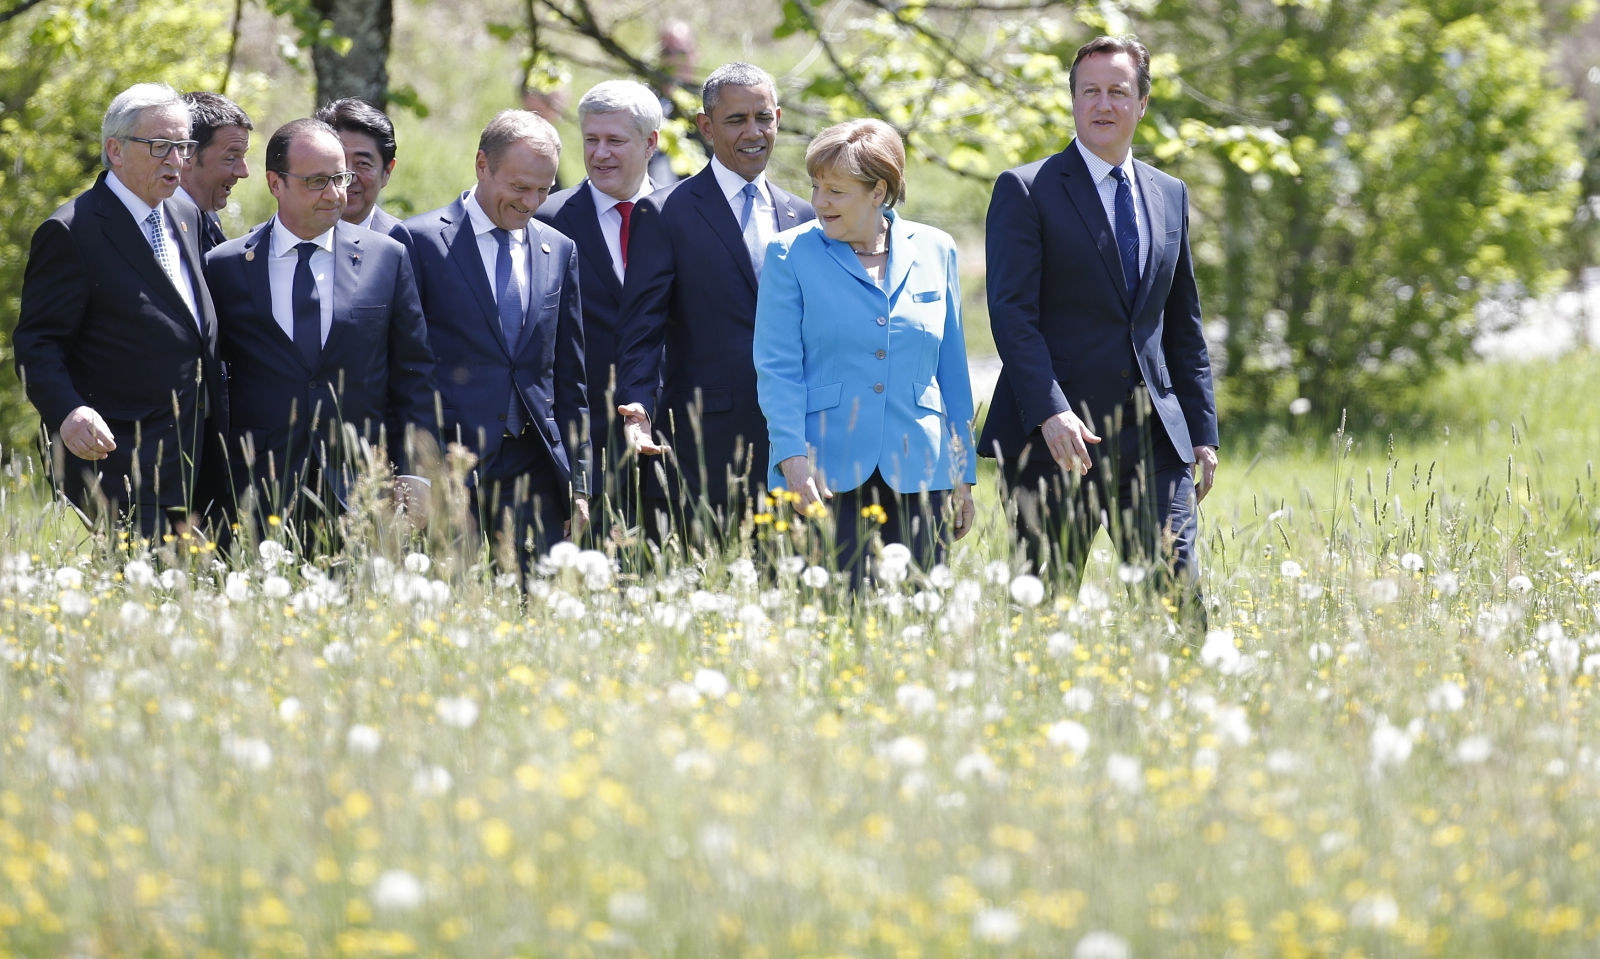 G7 summit Germany